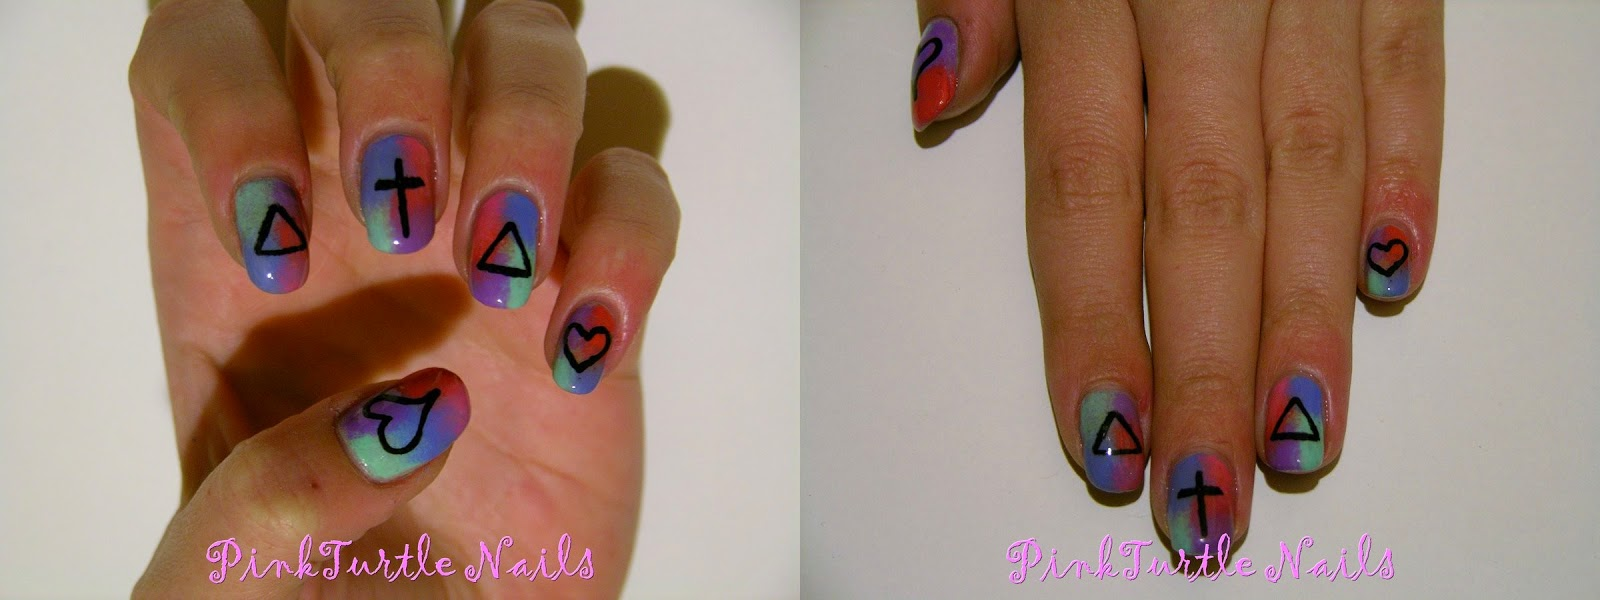 http://pinkturtlenails.blogspot.com.es/2015/03/reto-31-dias-tutorial-link.html